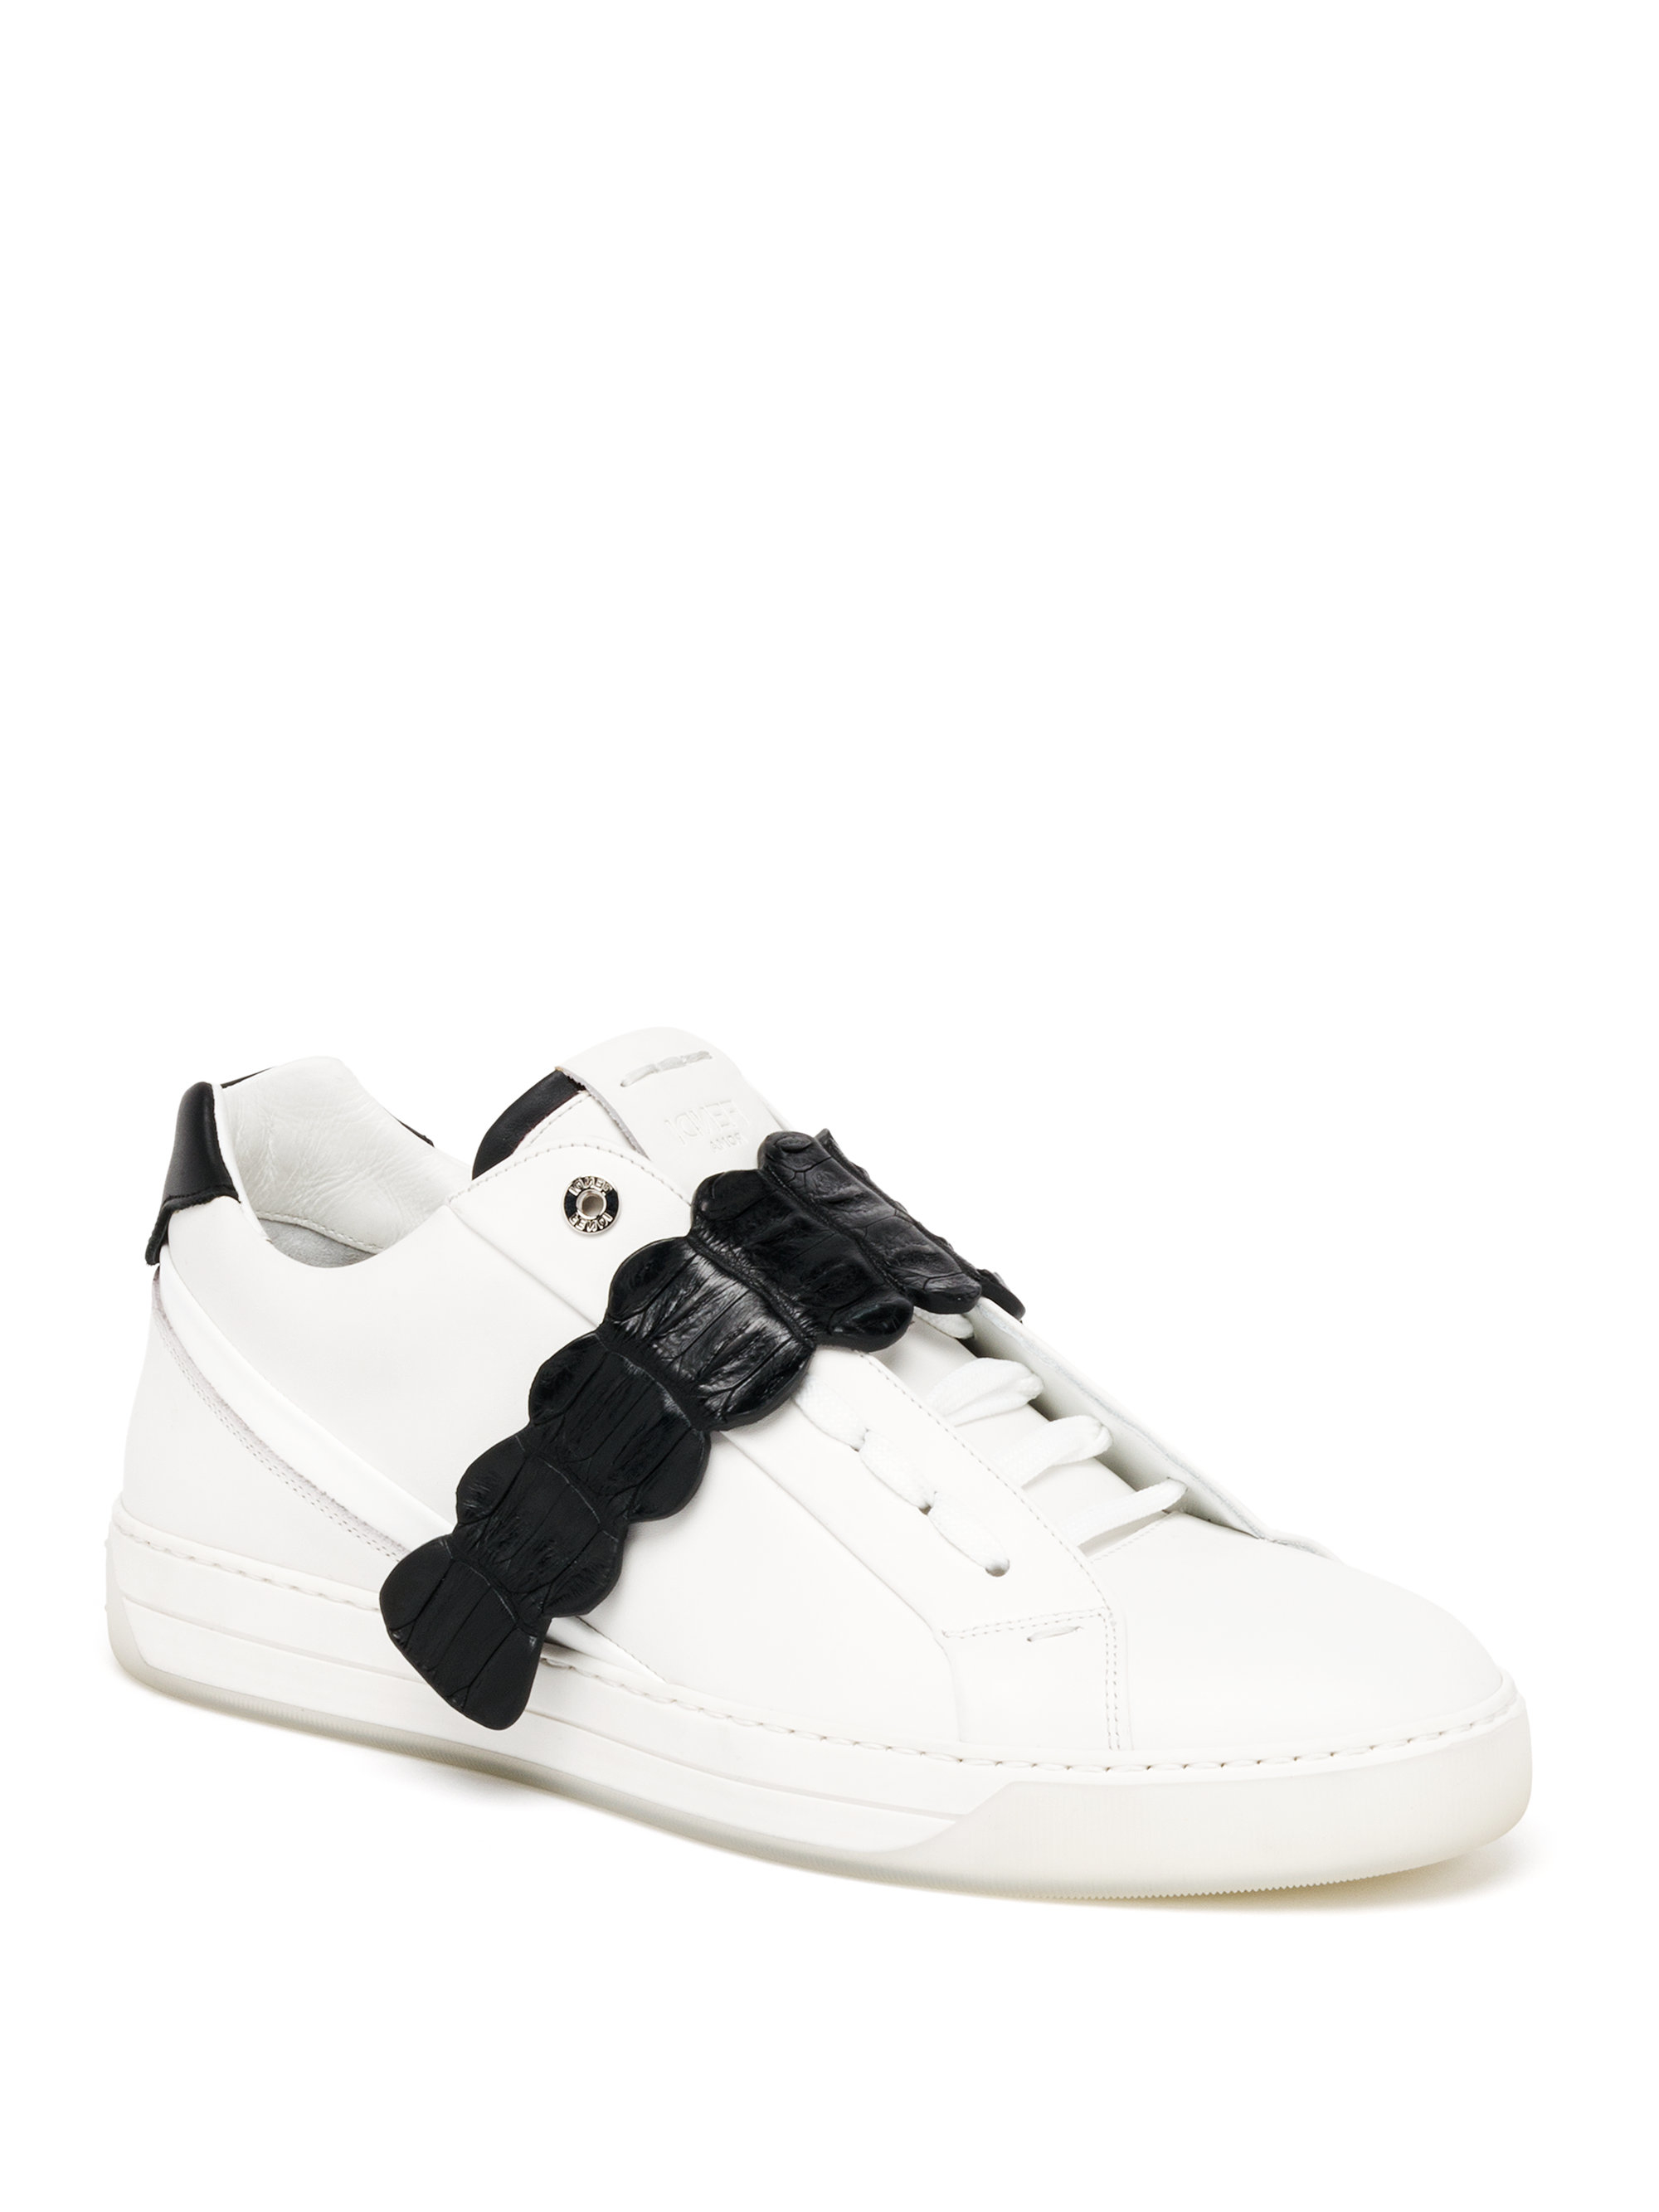 Fendi Crocodile-strap Low-rise Leather